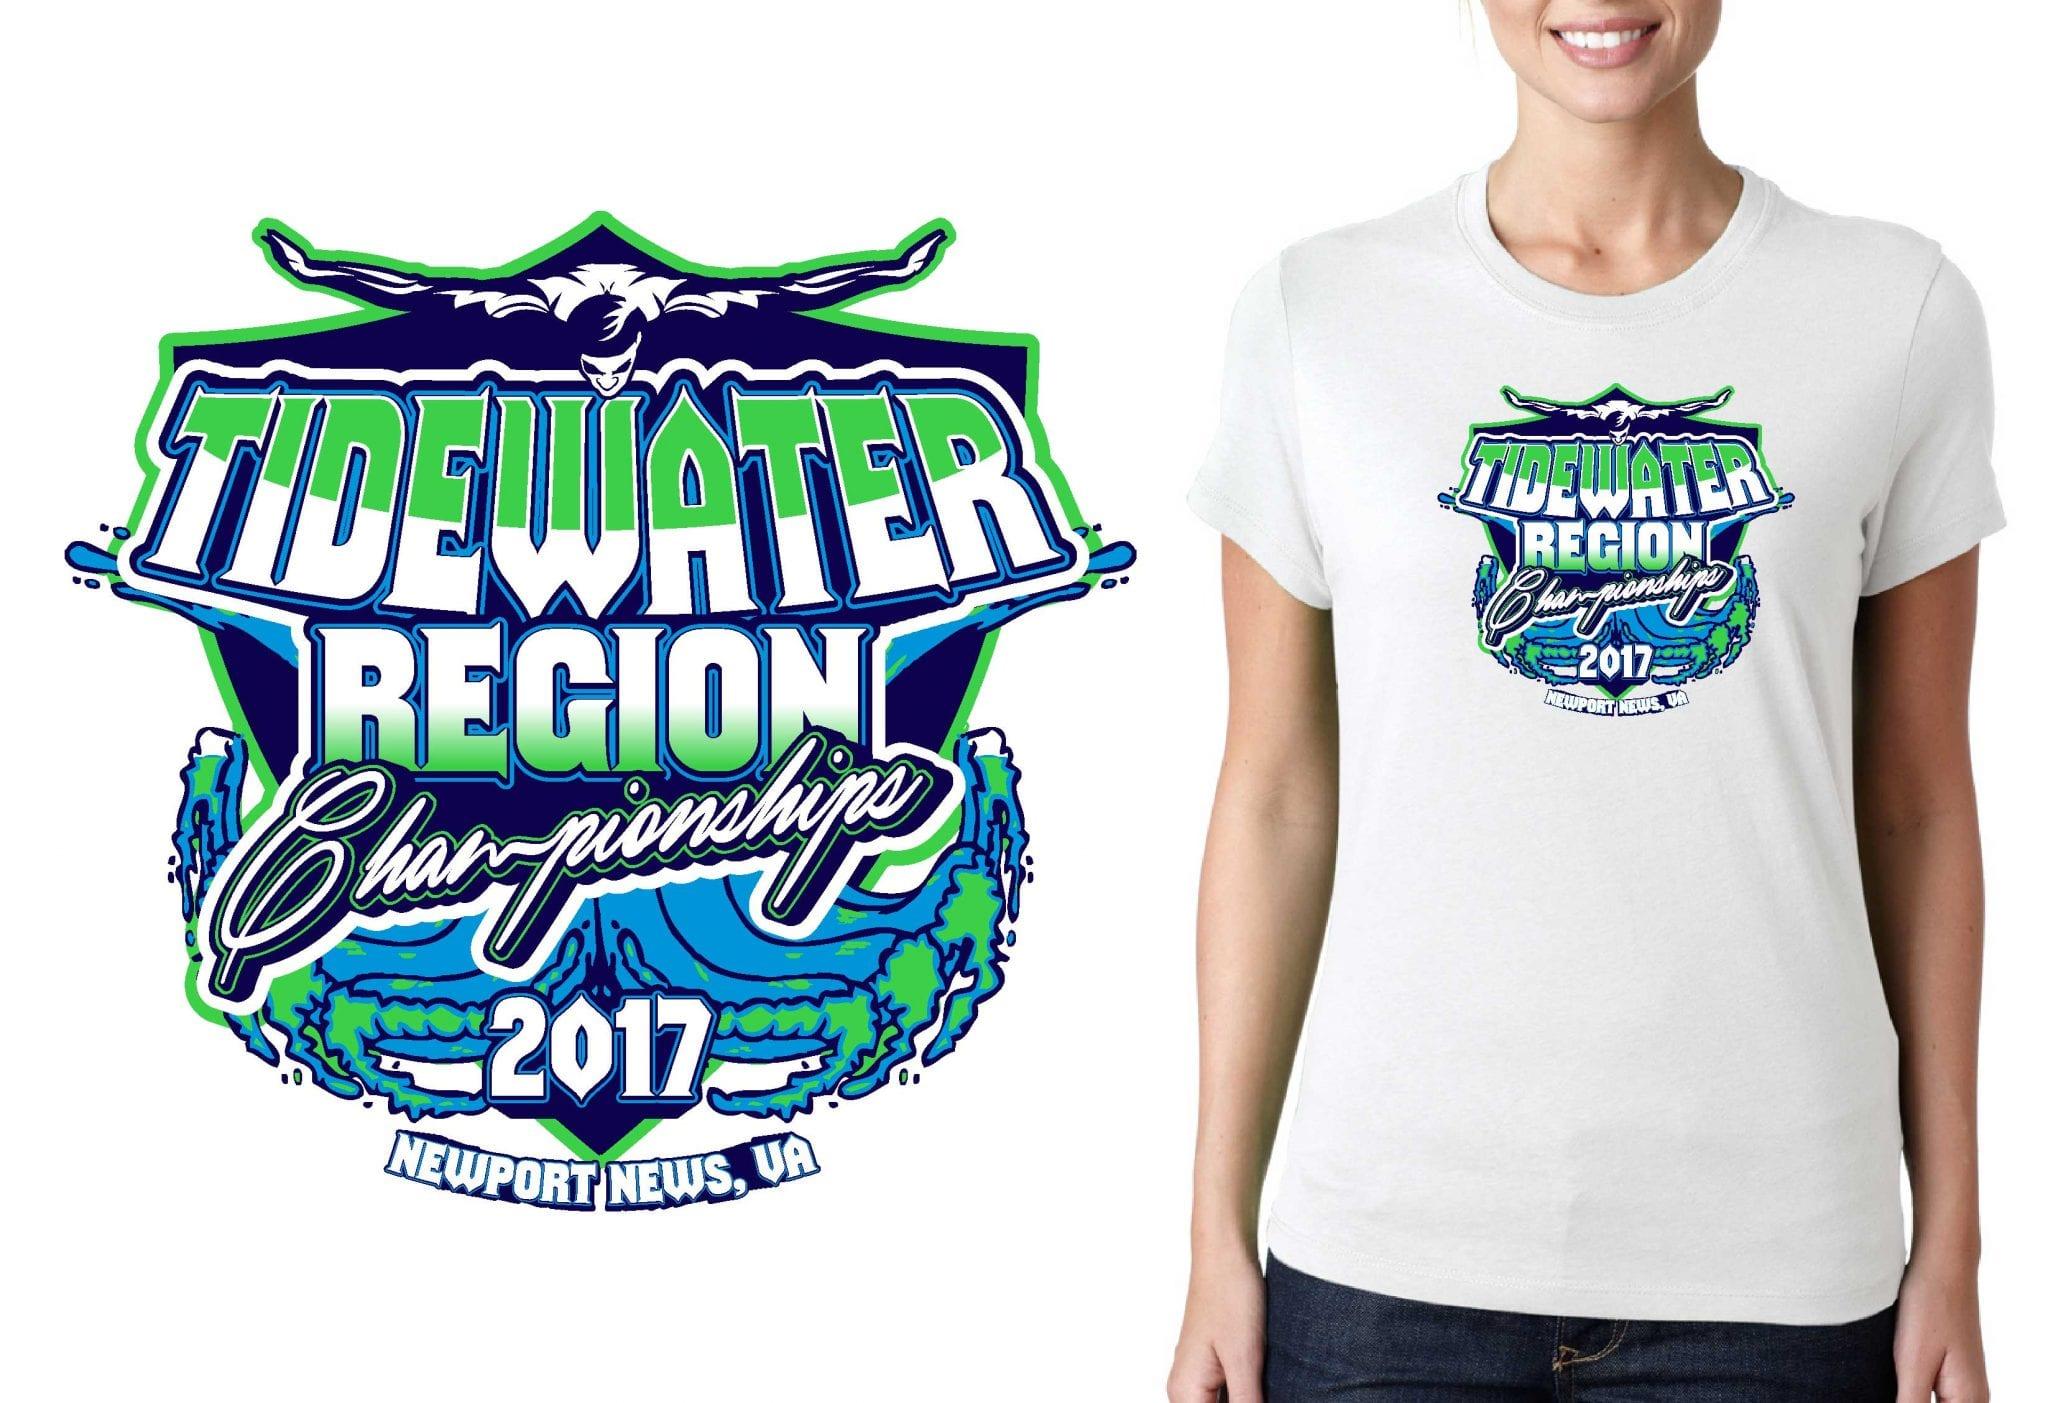 SWIMMING T SHIRT LOGO DESIGN Tidewater-Region-Championships BY UrArtStudio